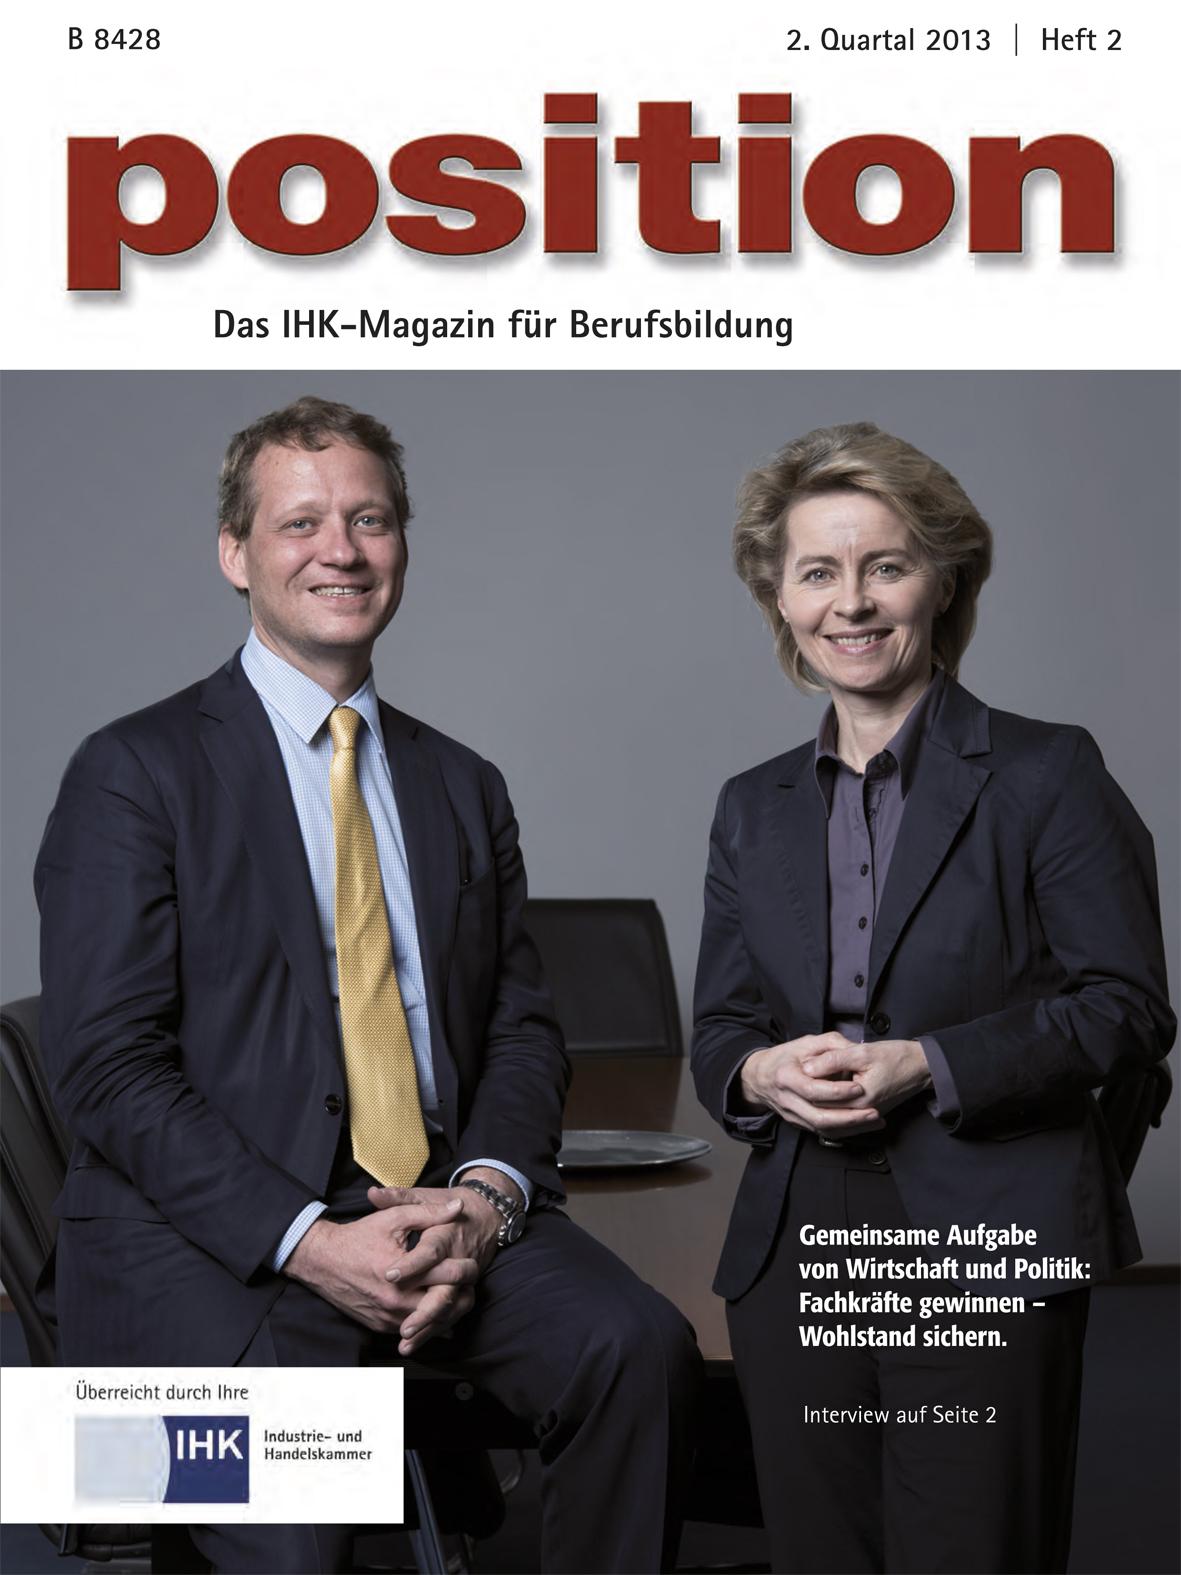 Titel-position-2-2013